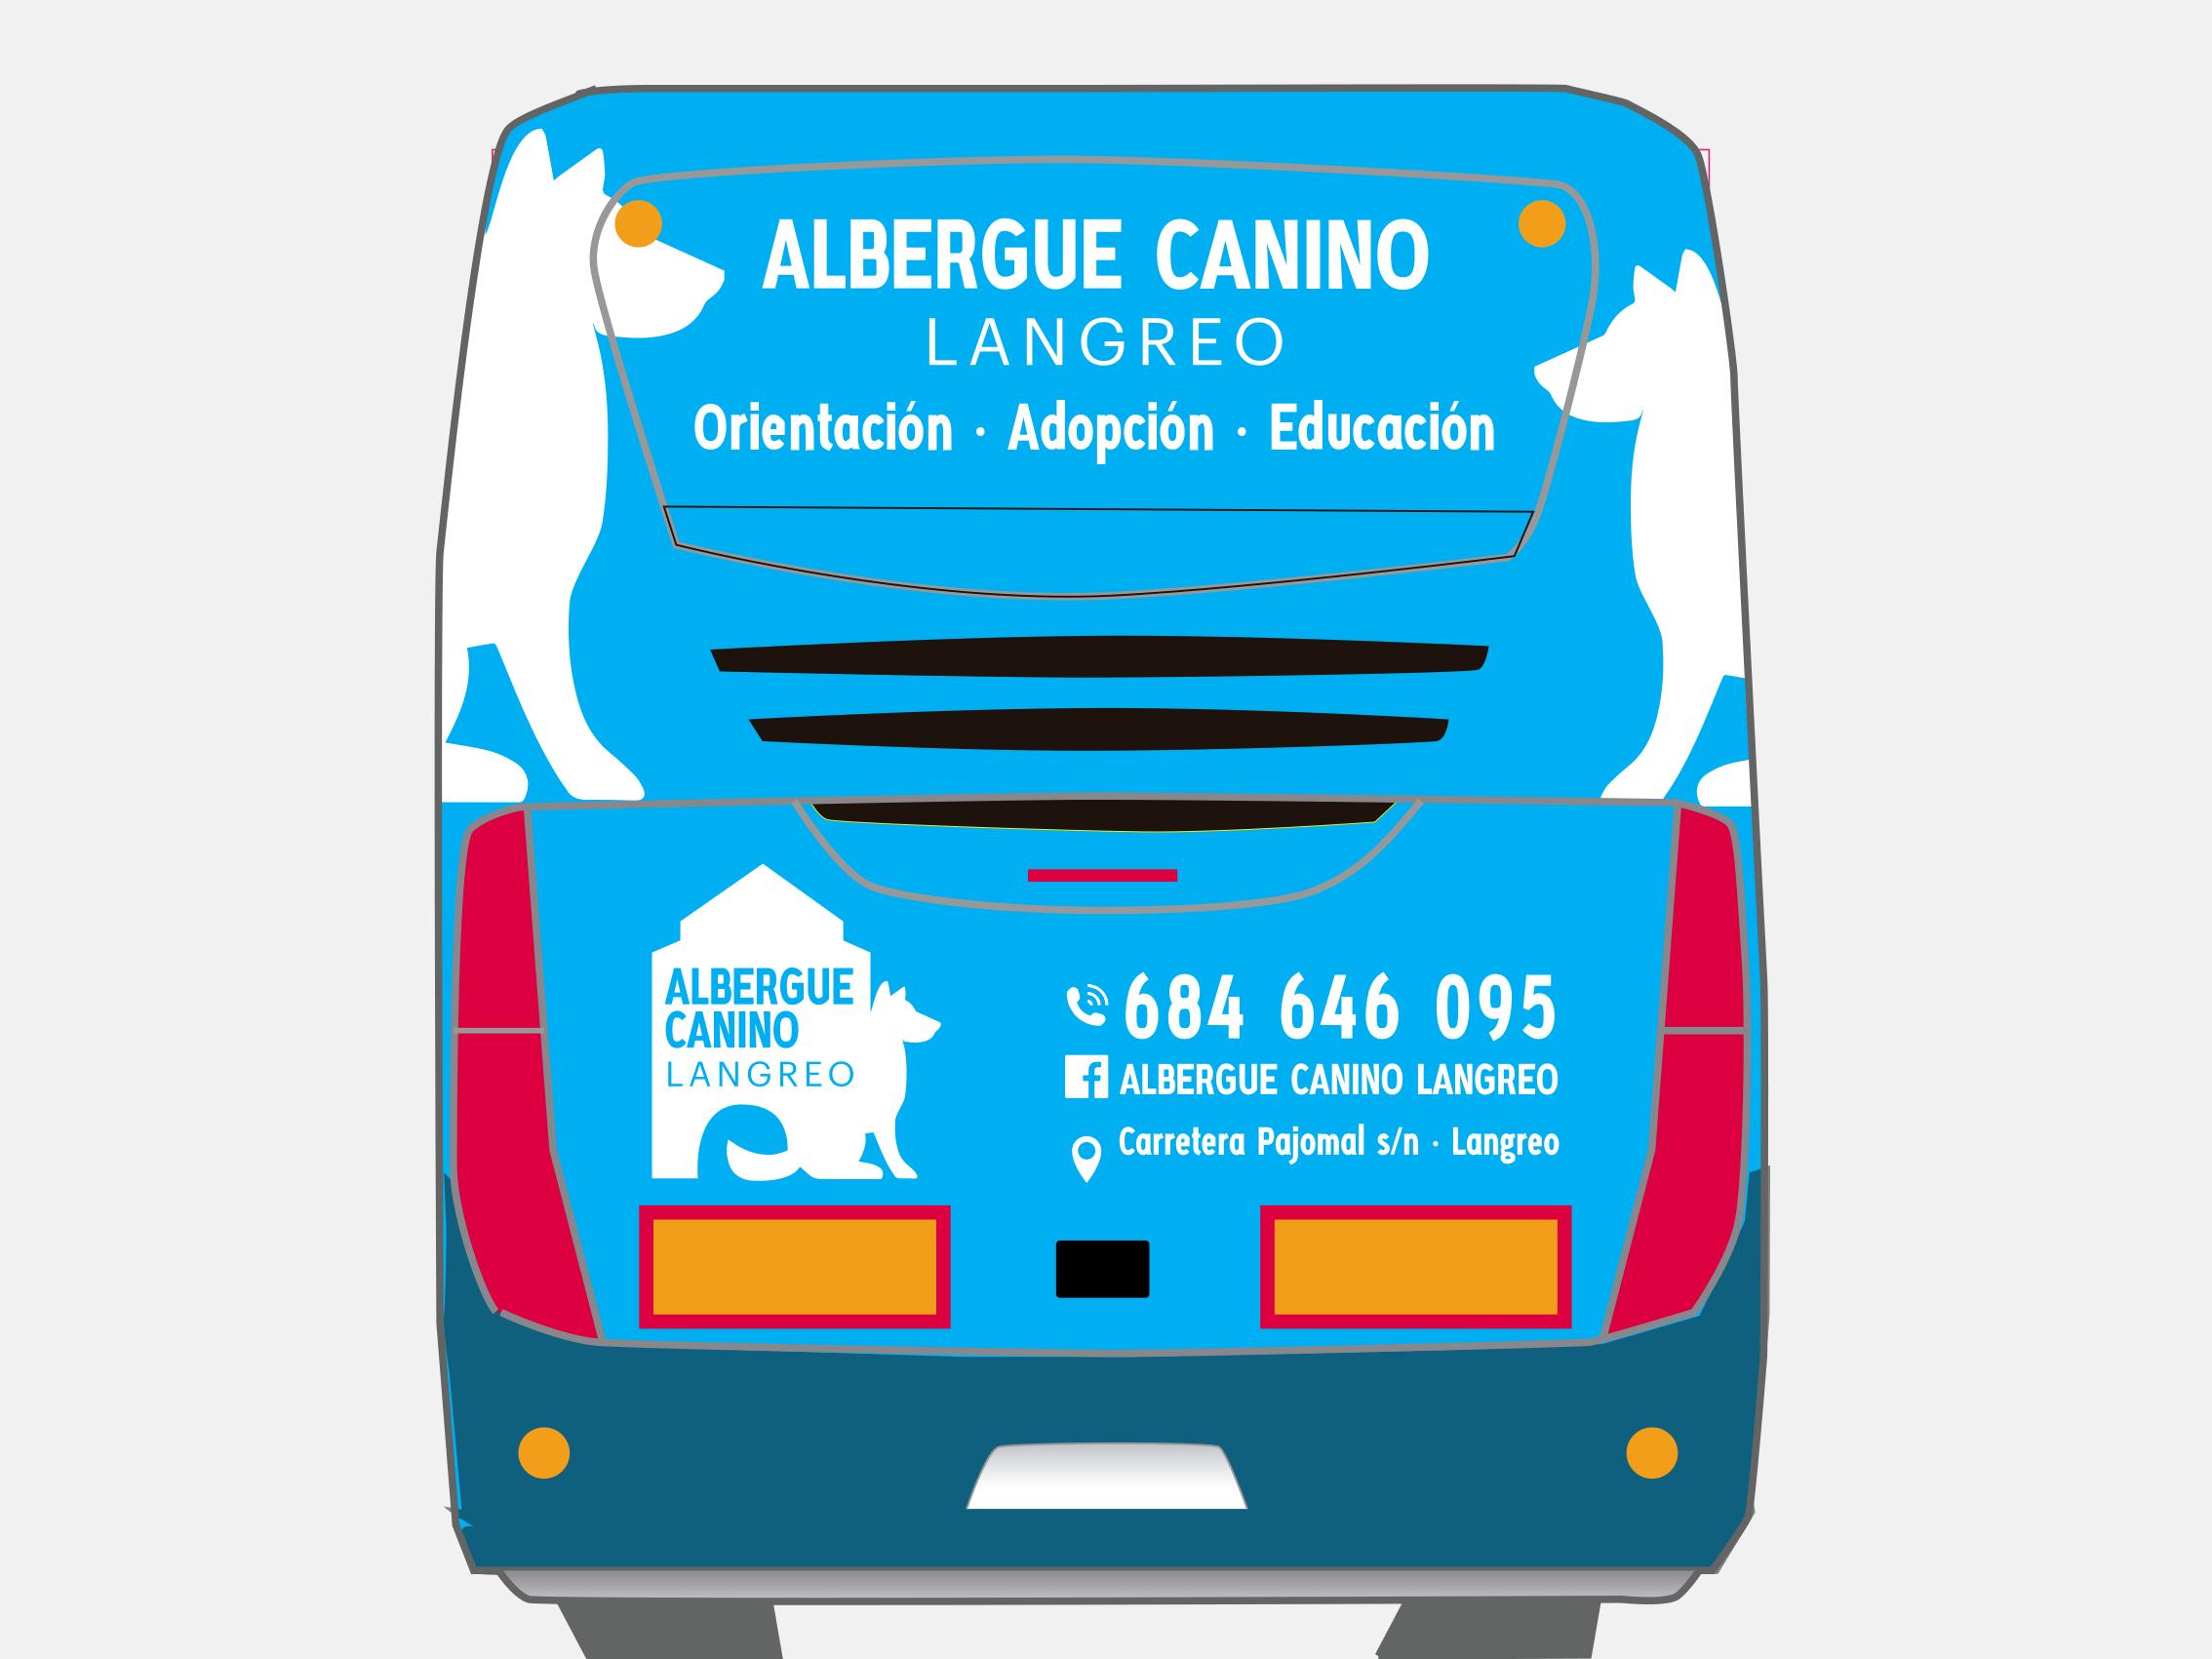 Autobús Albergue Canino Langreo